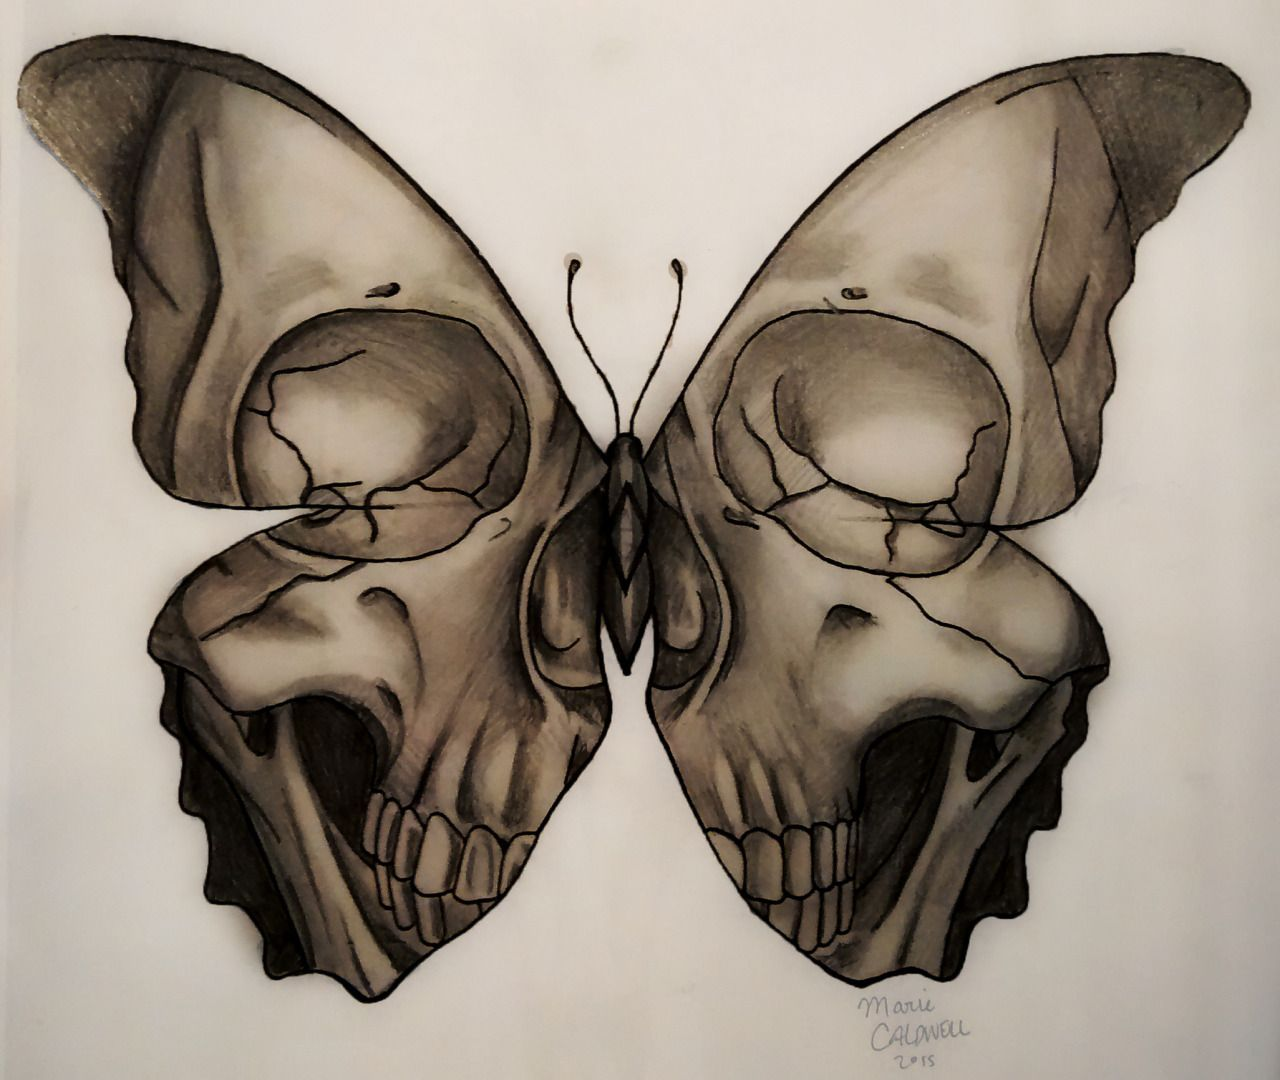 medusa illustration u201cskull butterfly tattoo design marie caldwell rh pinterest com Skull and Cross Tattoo Designs Skull and Cross Tattoo Designs